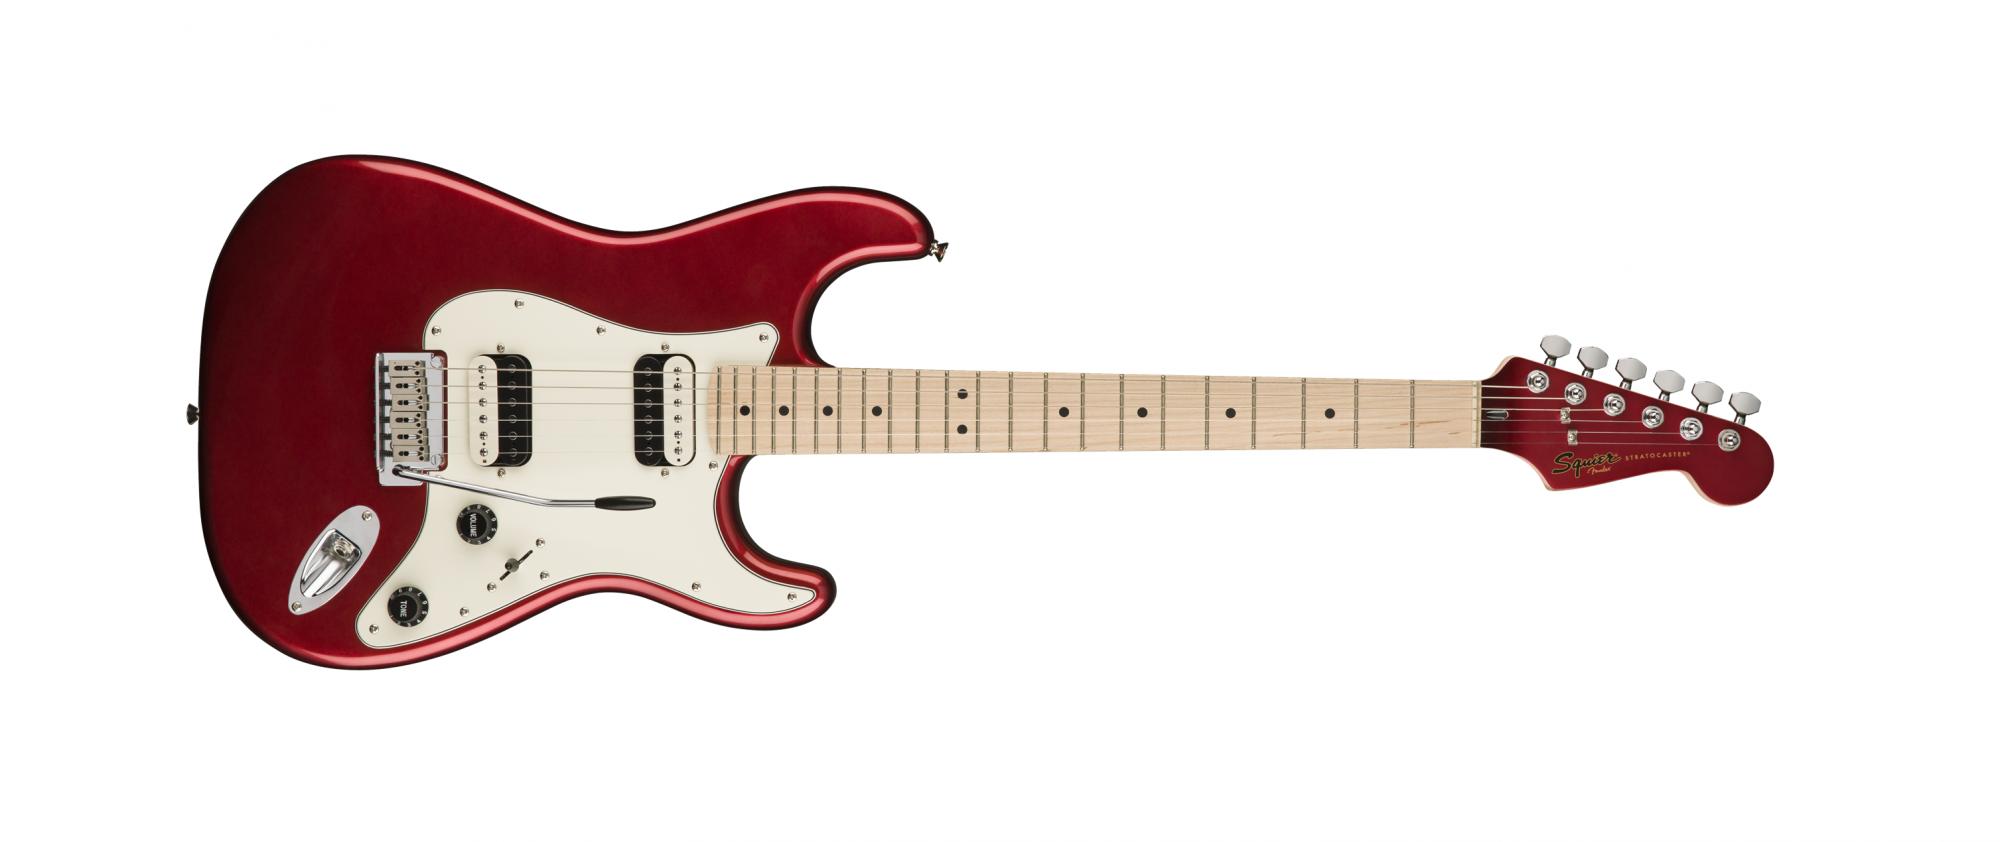 Fender Squier Contemporary Stratocaster HH Maple Fingerboard Dark Metallic Red